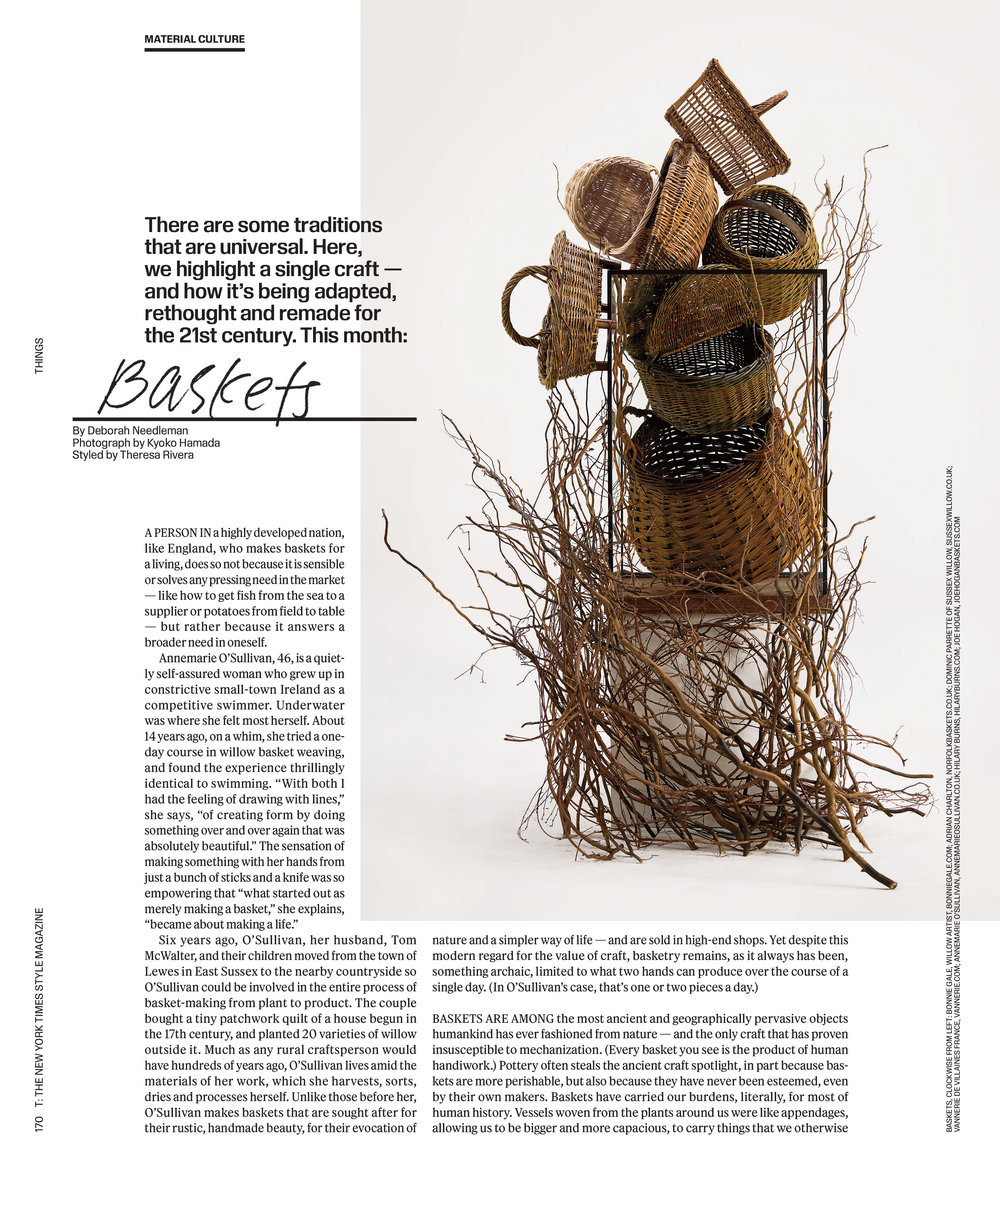 16 Things - Material Culture - Baskets-1.jpg